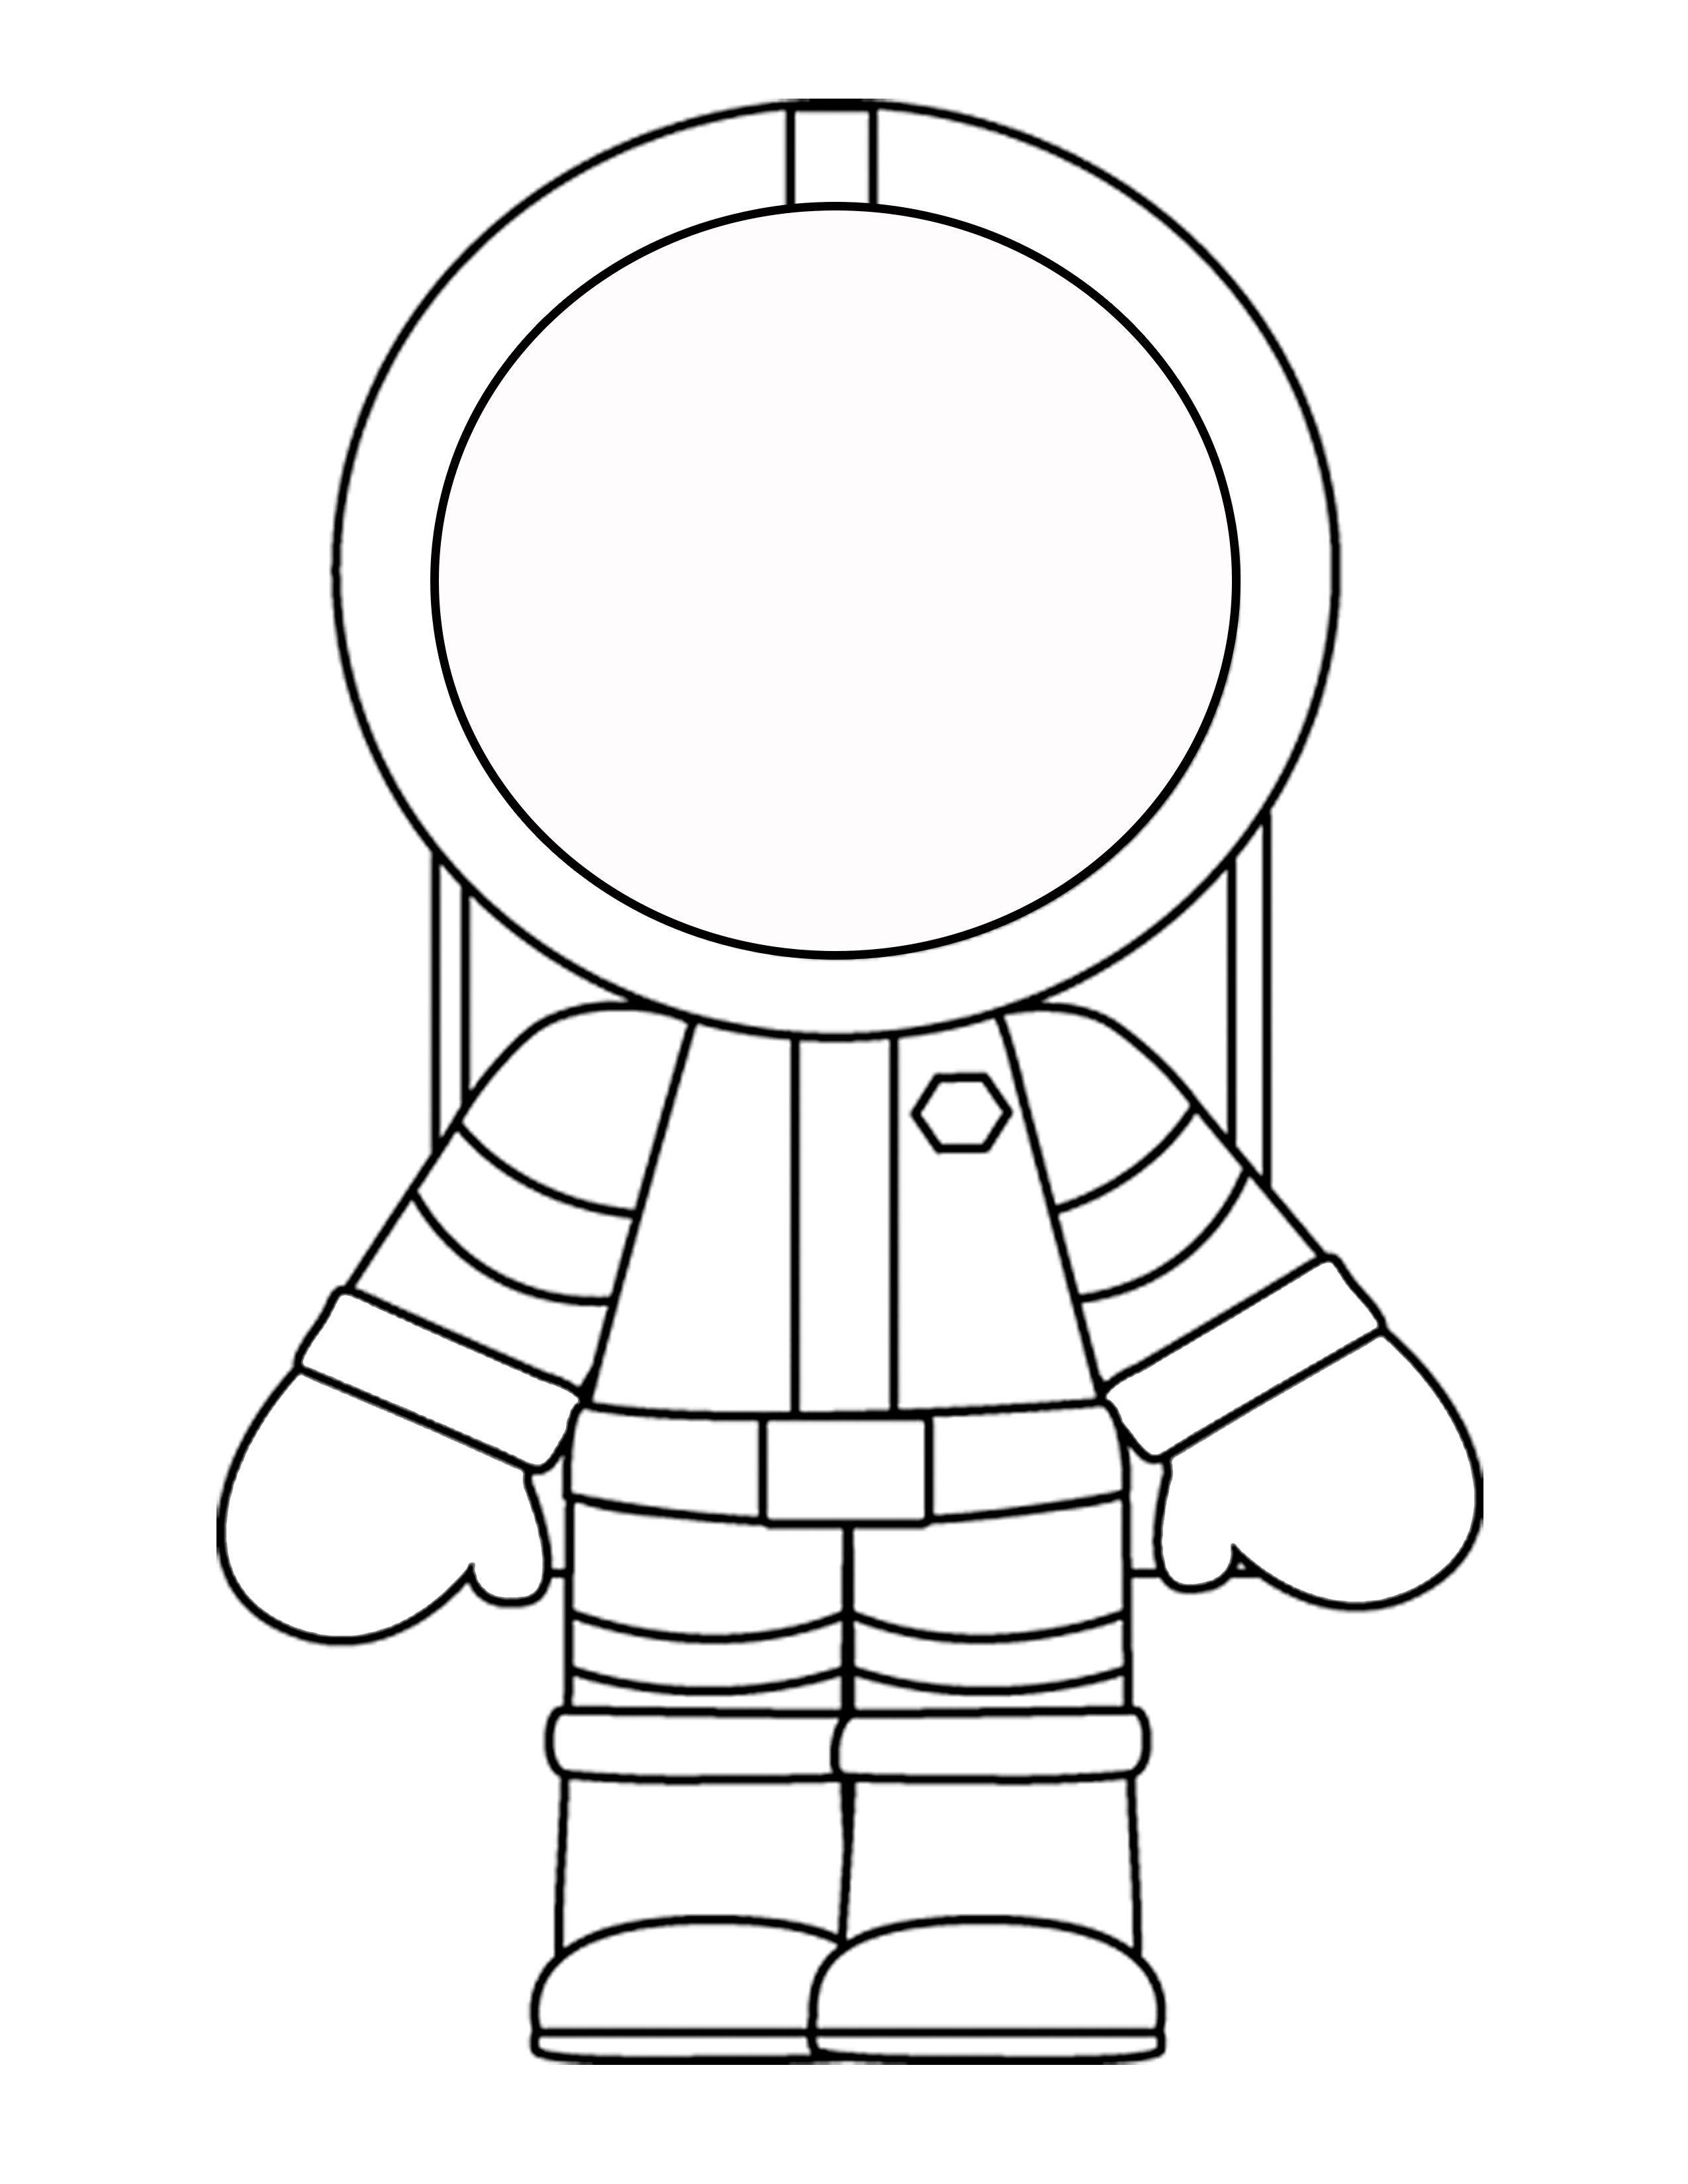 Astronaut Coloring Page Ubamjen Space Preschool Astronaut Craft Space Crafts For Kids